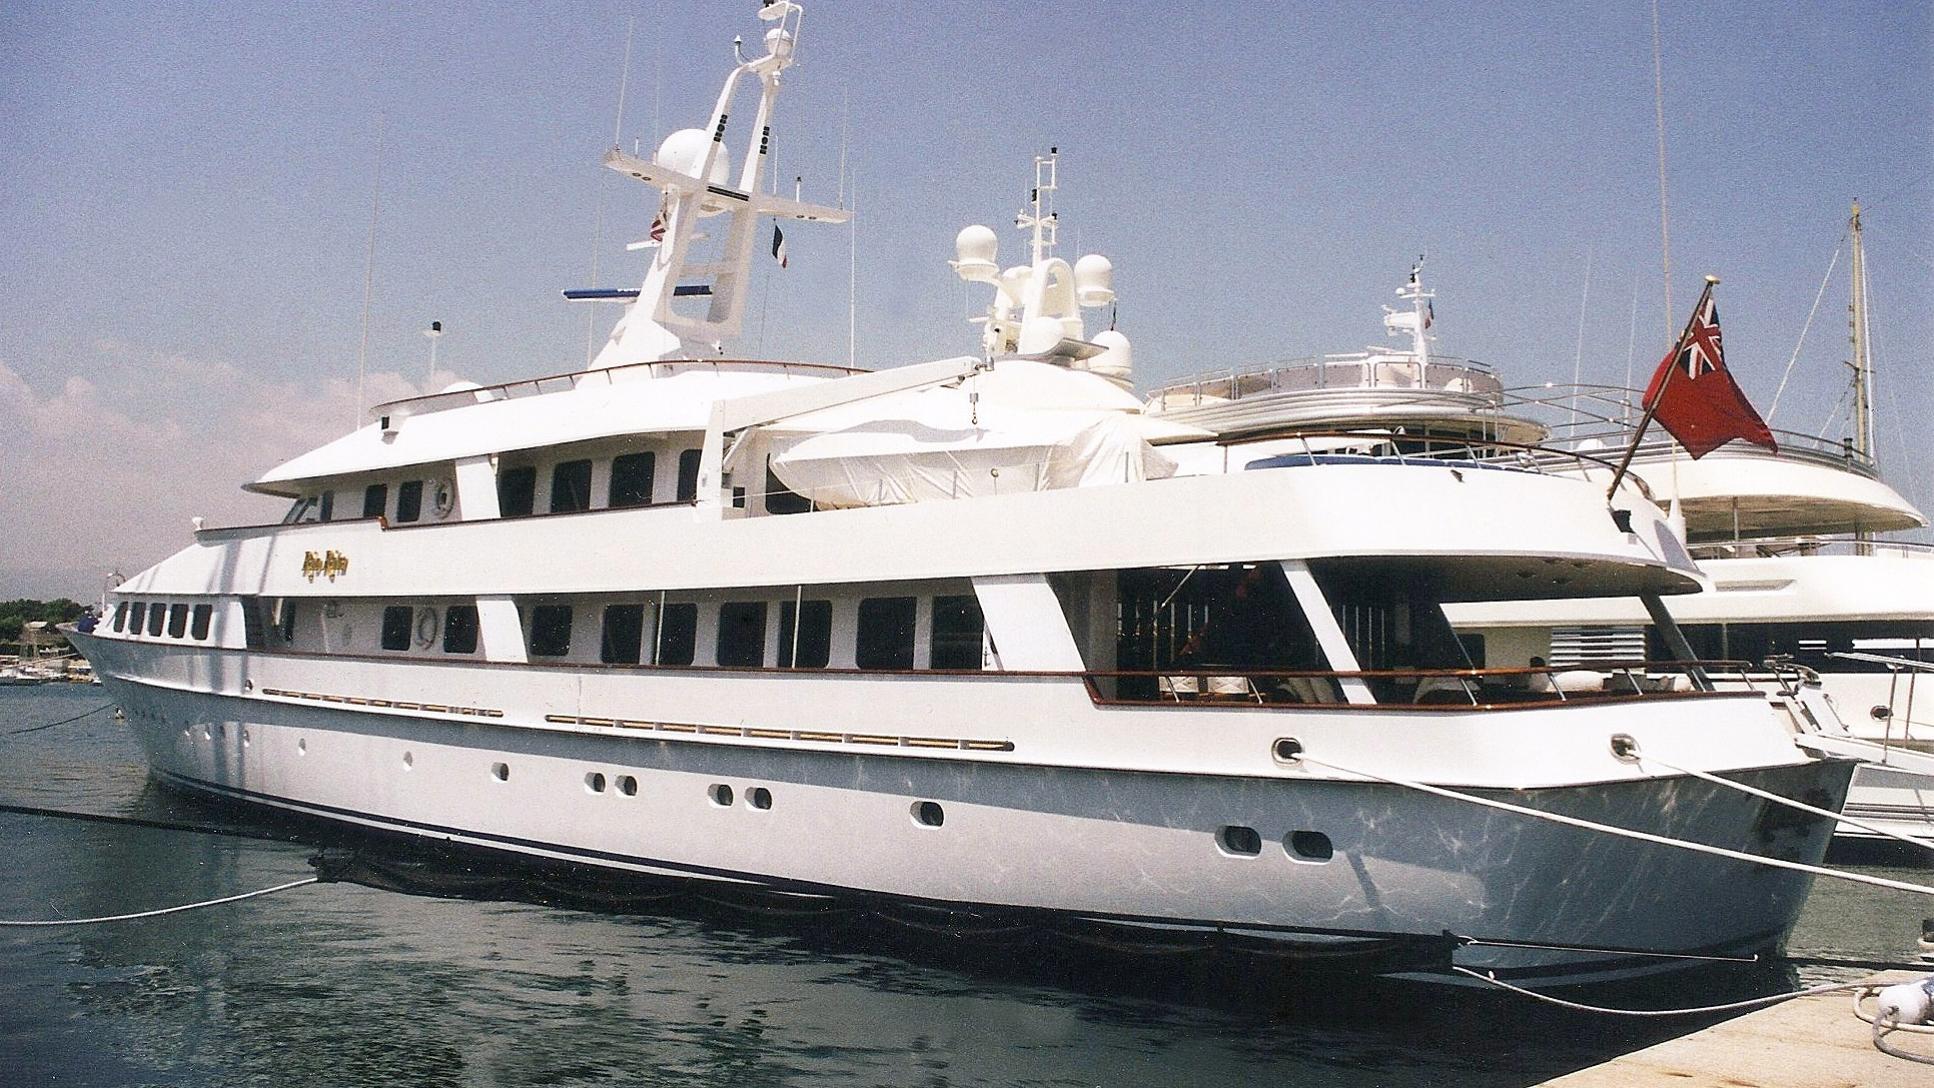 rio-rita-motor-yacht-feadship-1984-56m-stern-before-refit